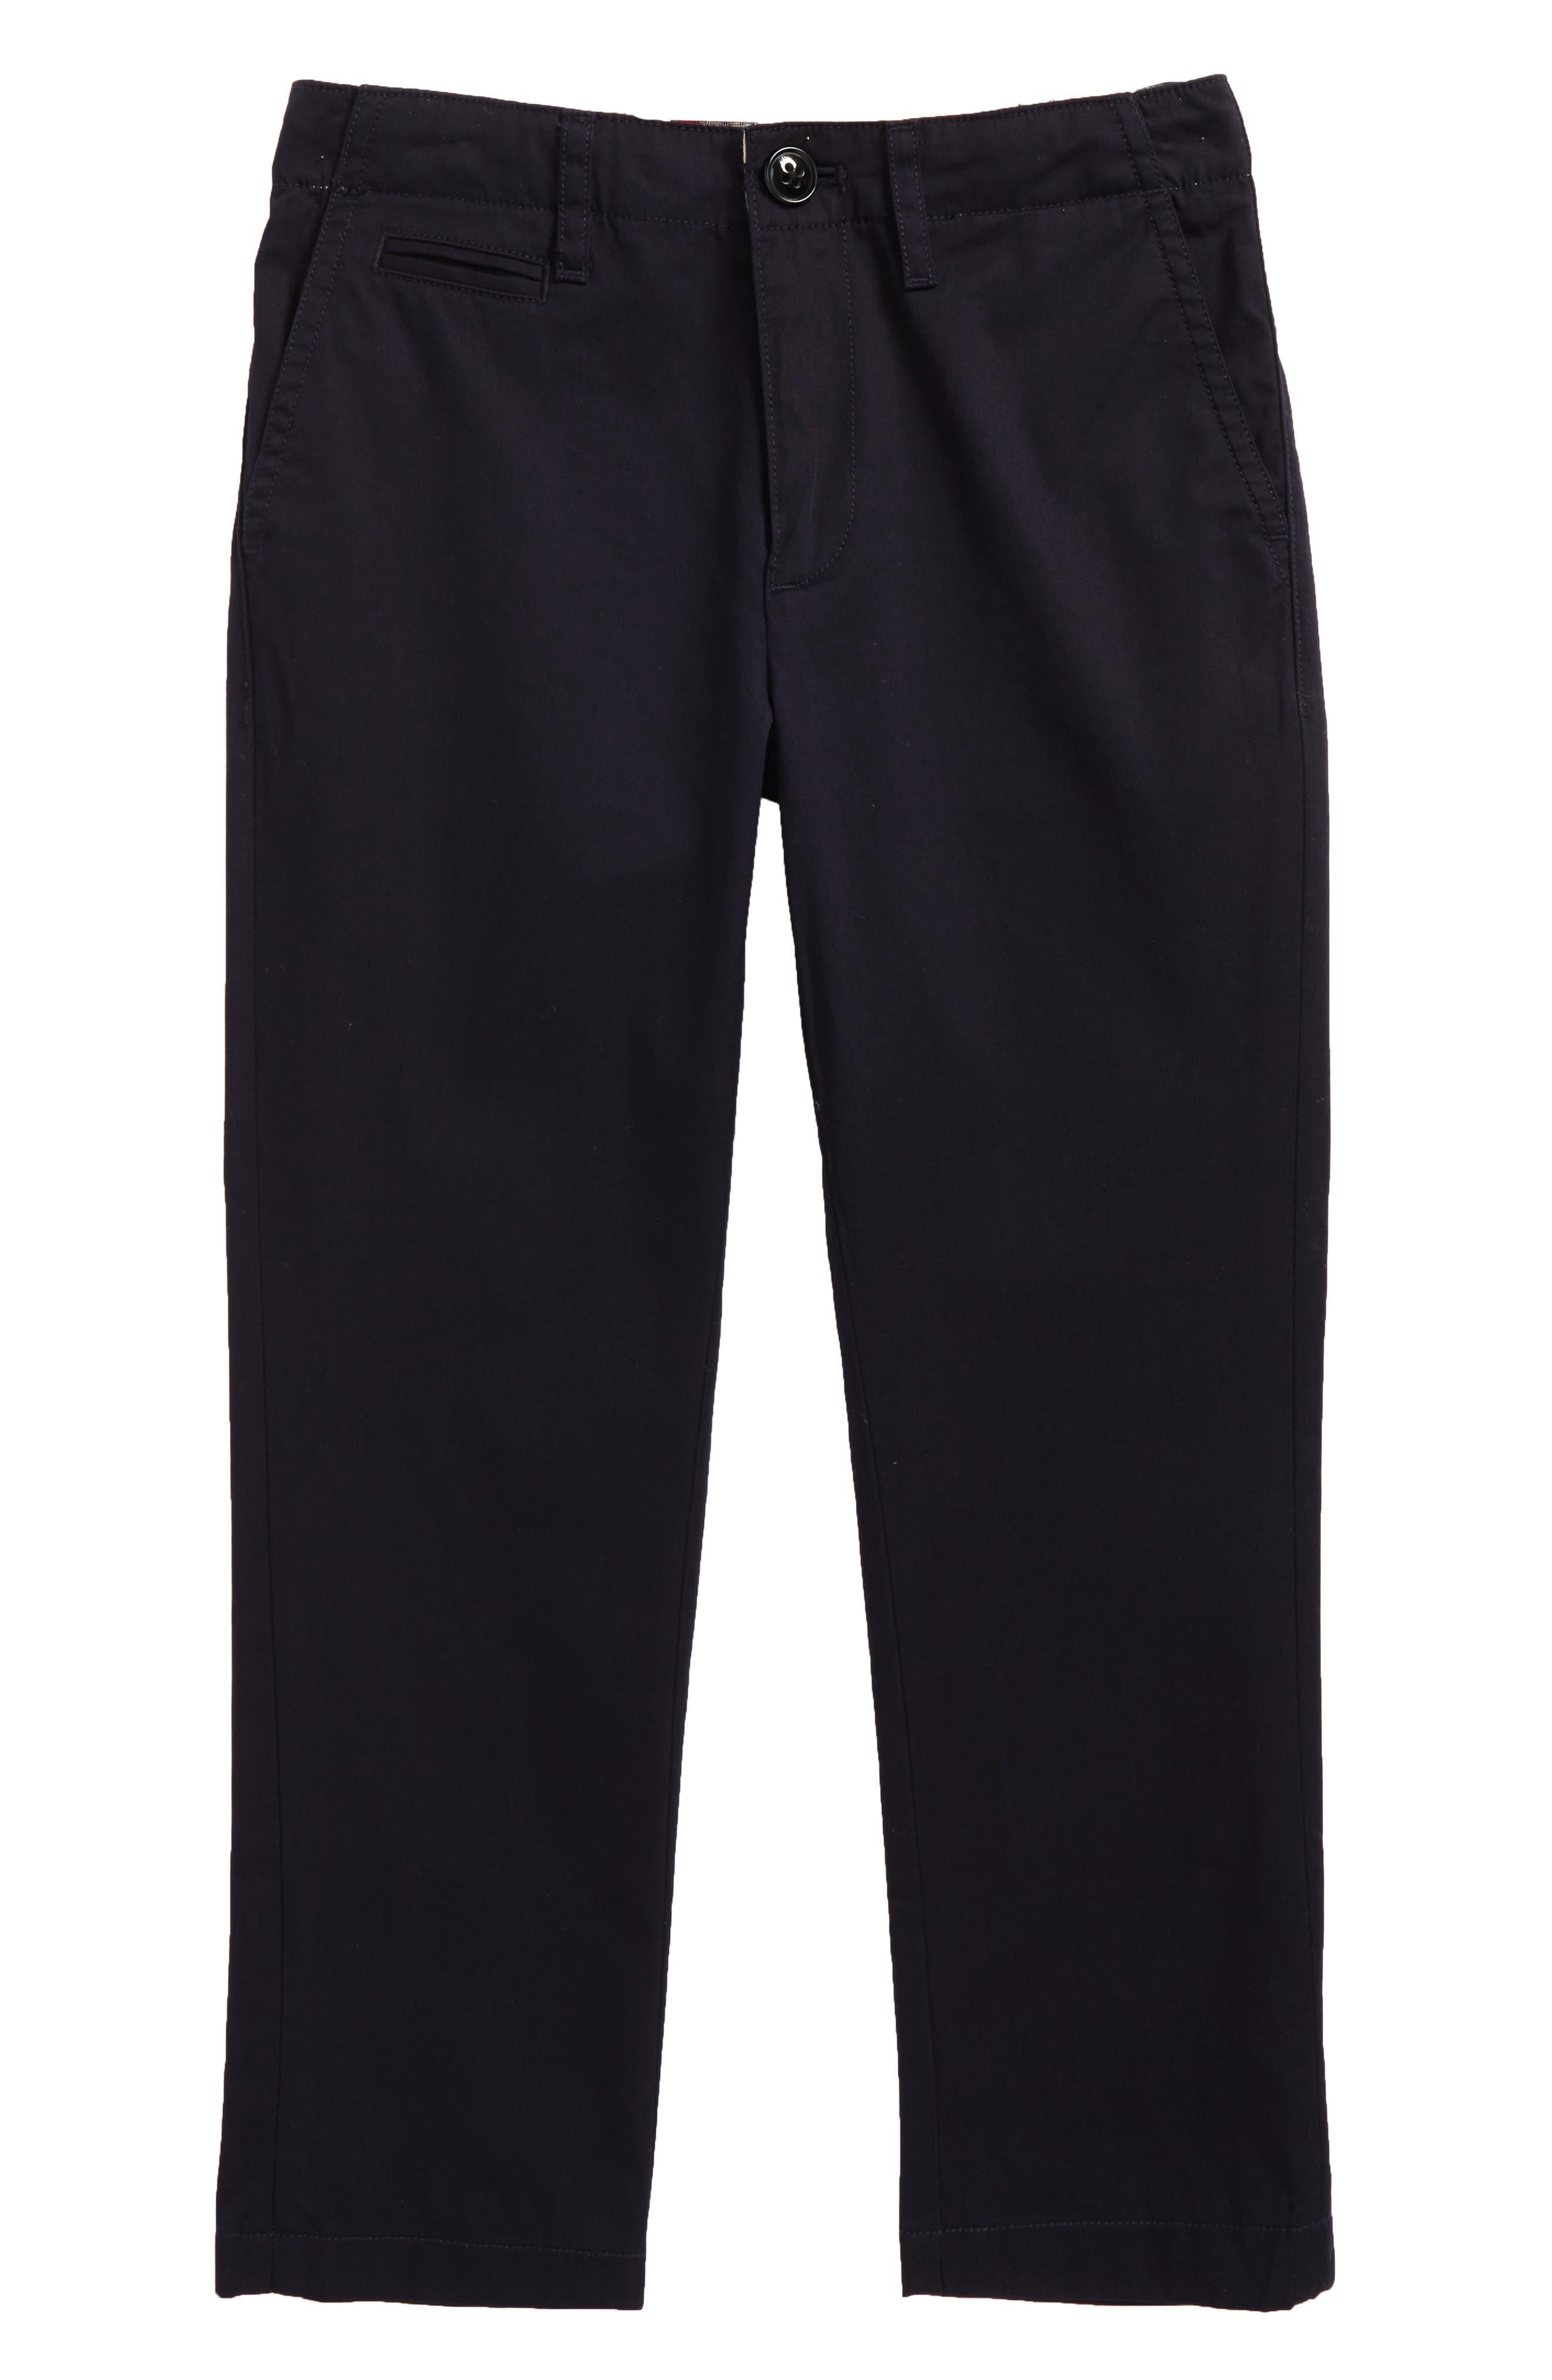 Main Image - Burberry Teo Straight Leg Pants (Little Boys & Big Boys)